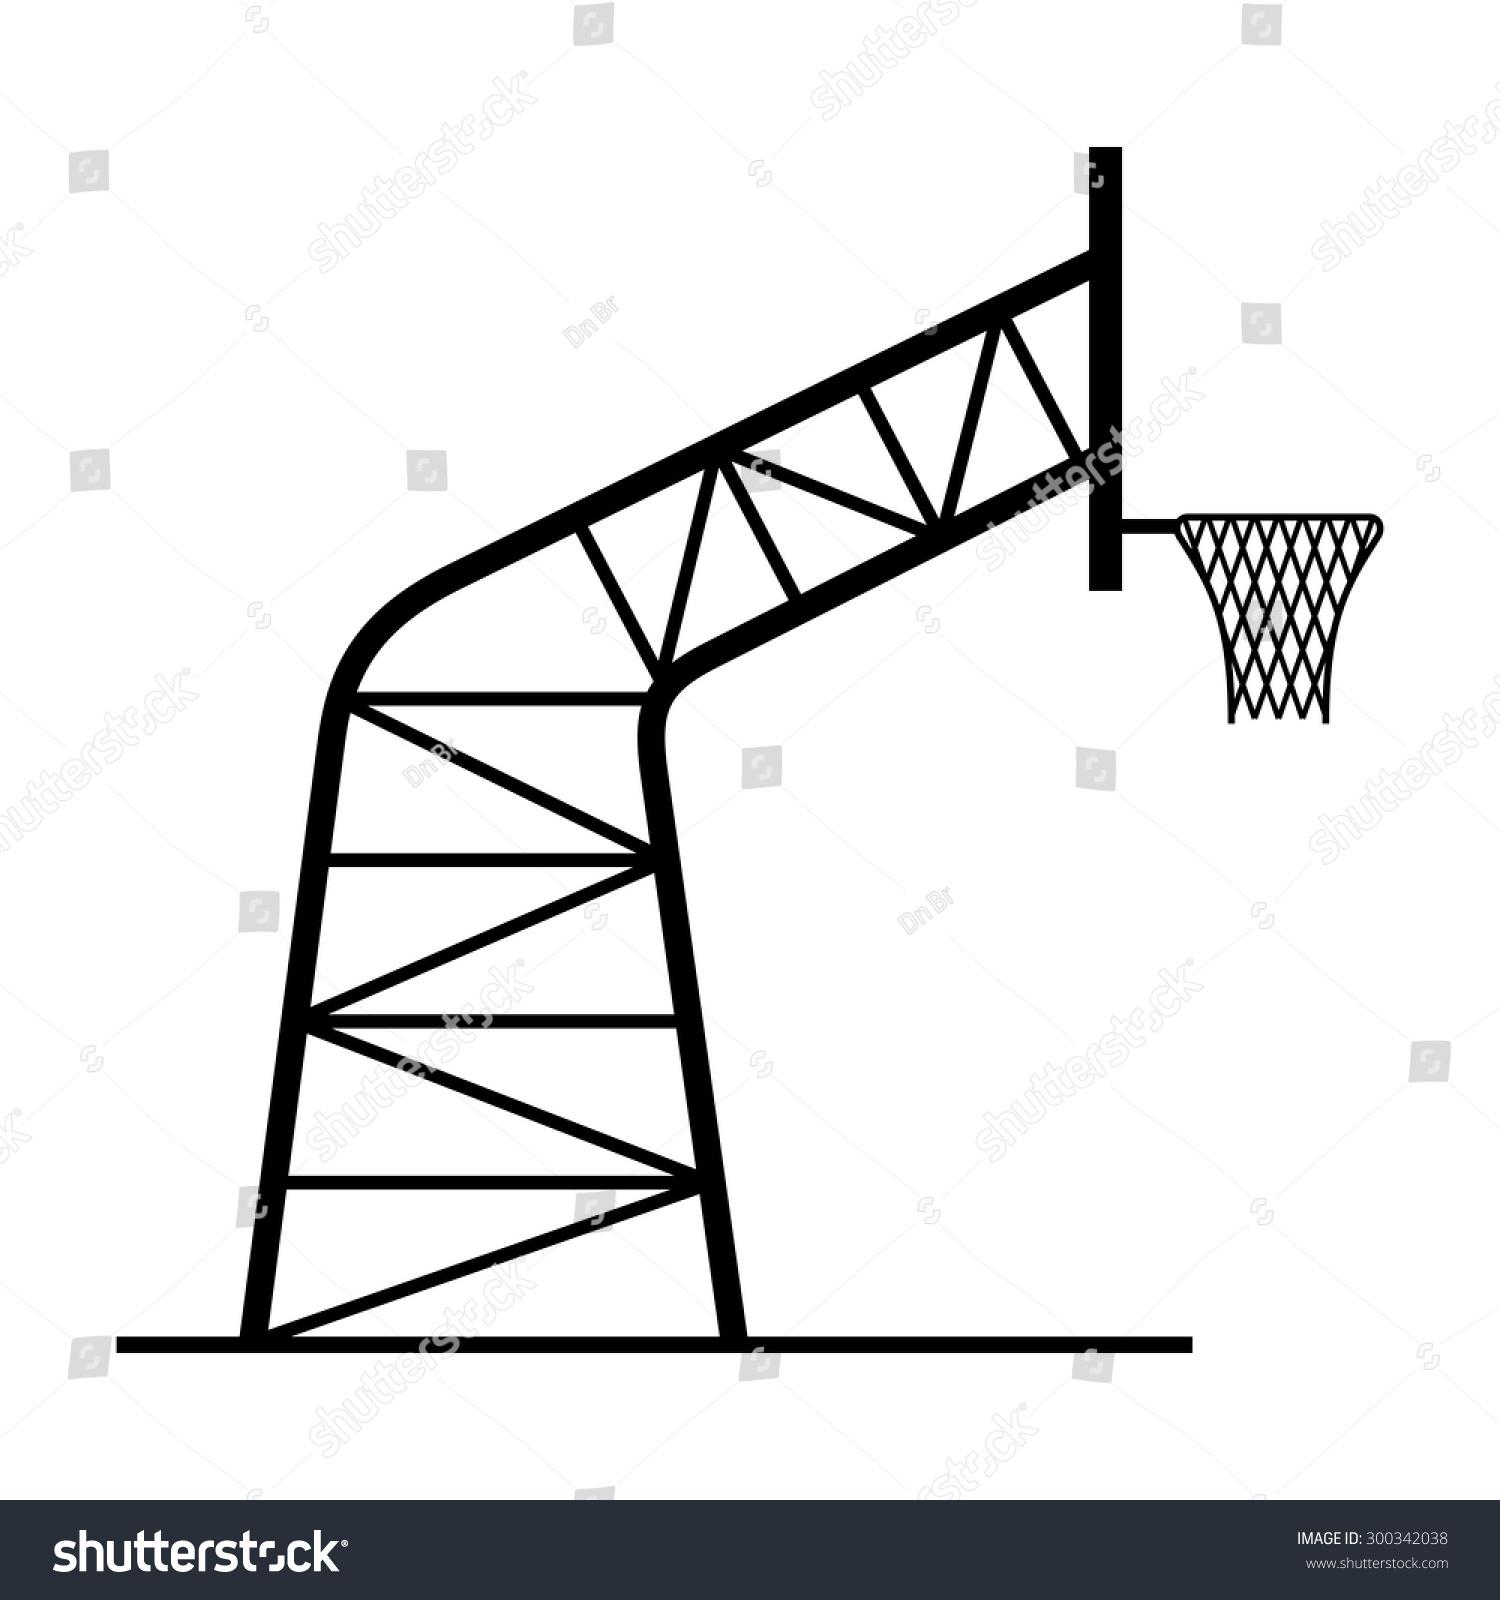 Basketball Hoop Stock Vector Royalty Free 300342038 Shutterstock Dimensions Diagram